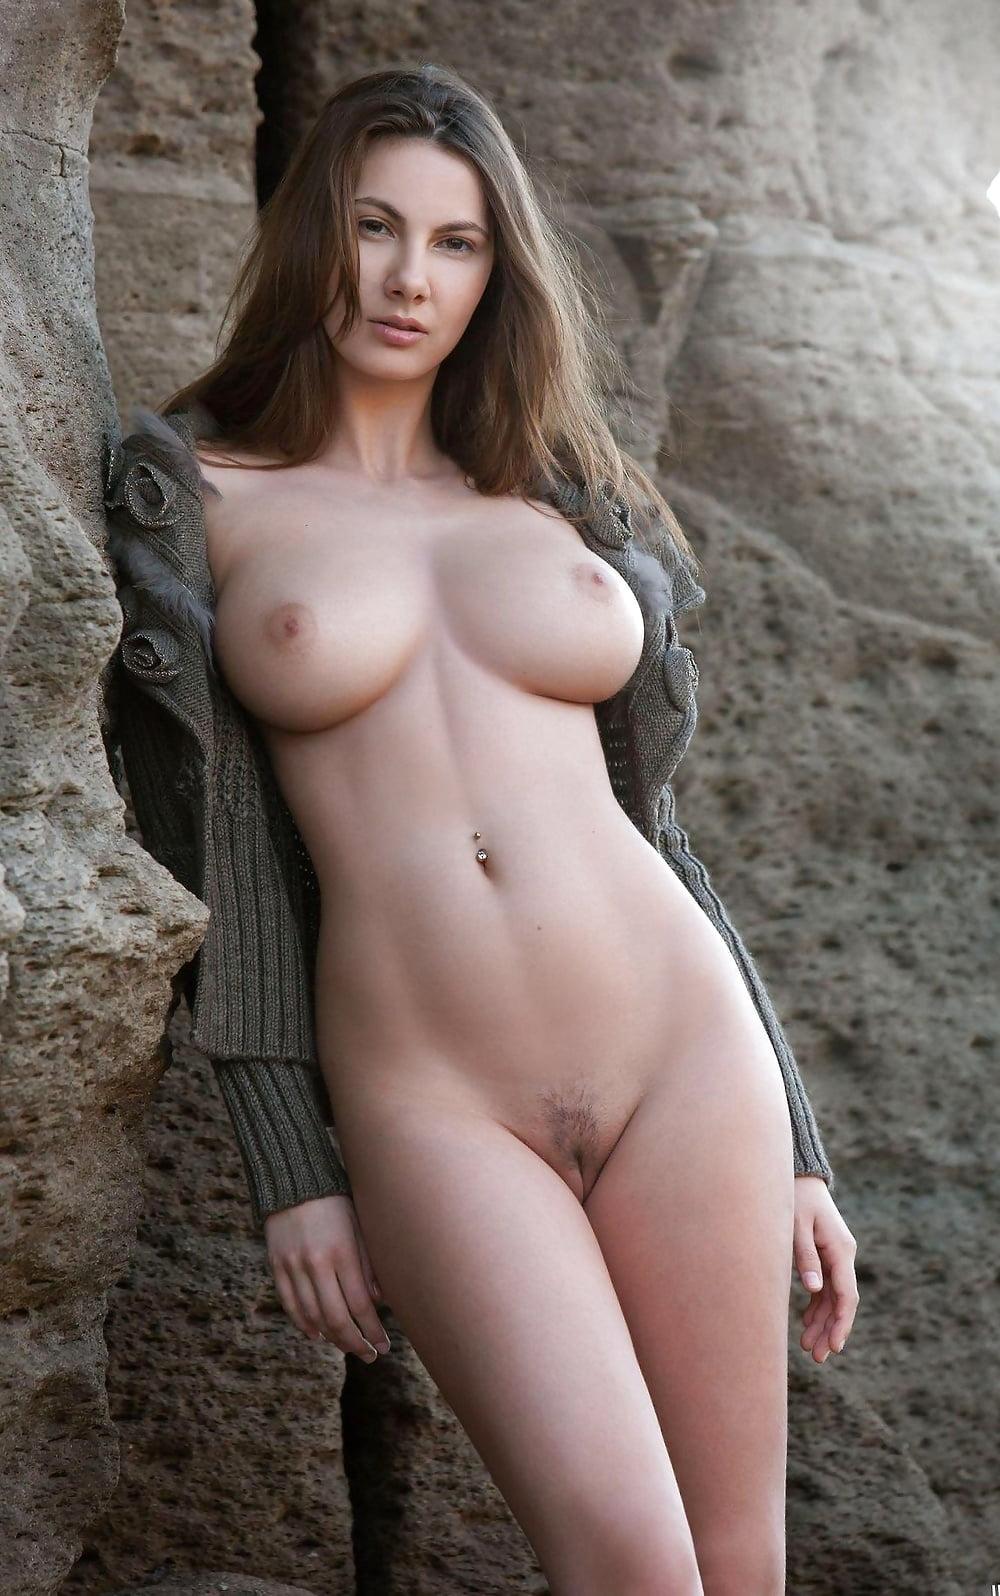 Battlestar girls nude — photo 8